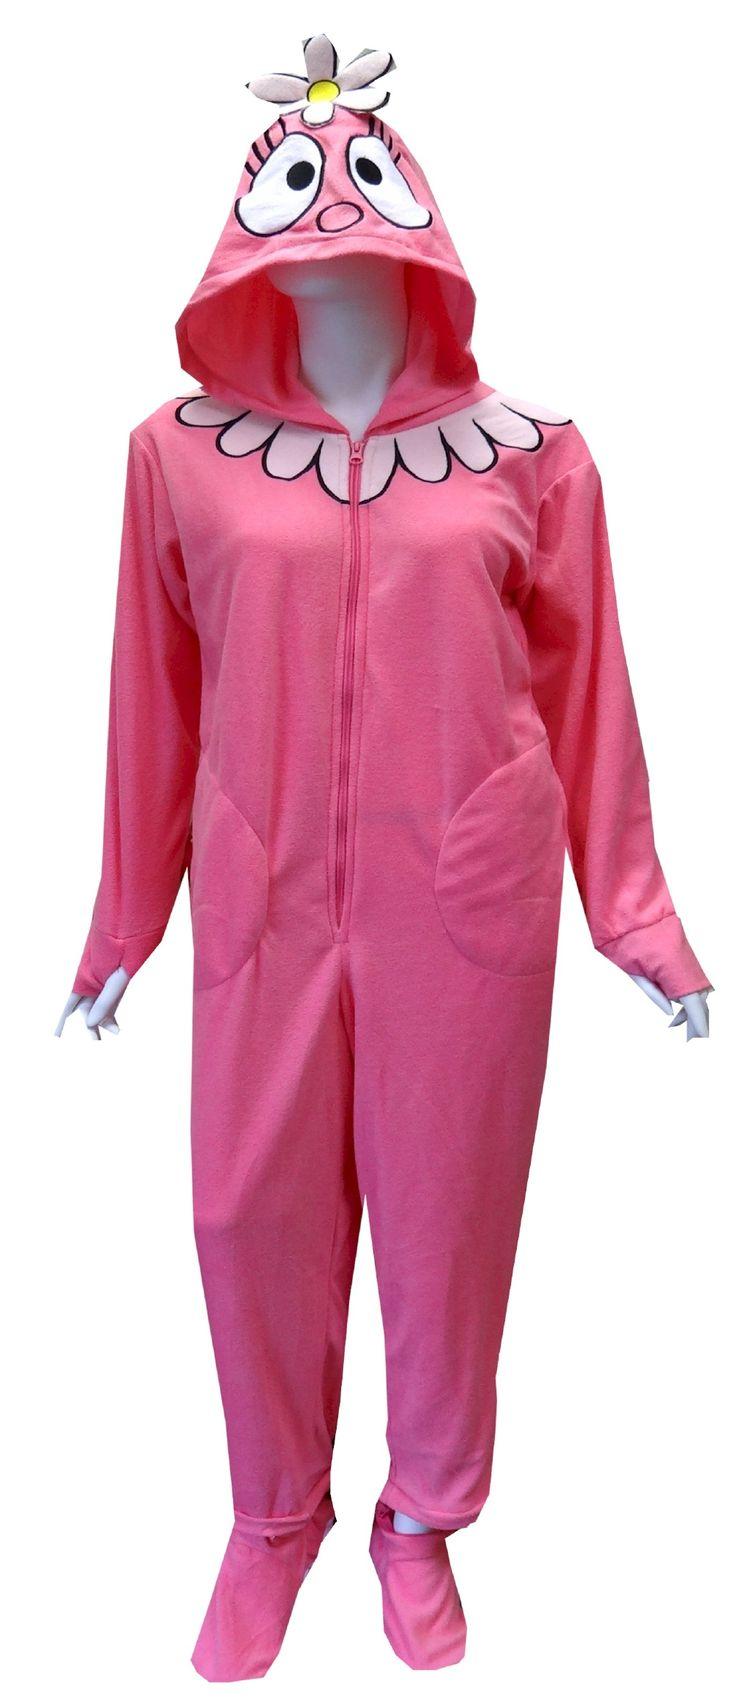 Yo Gabba Gabba Foofa Adult Footie Onesie Pajamas   Awesome ...